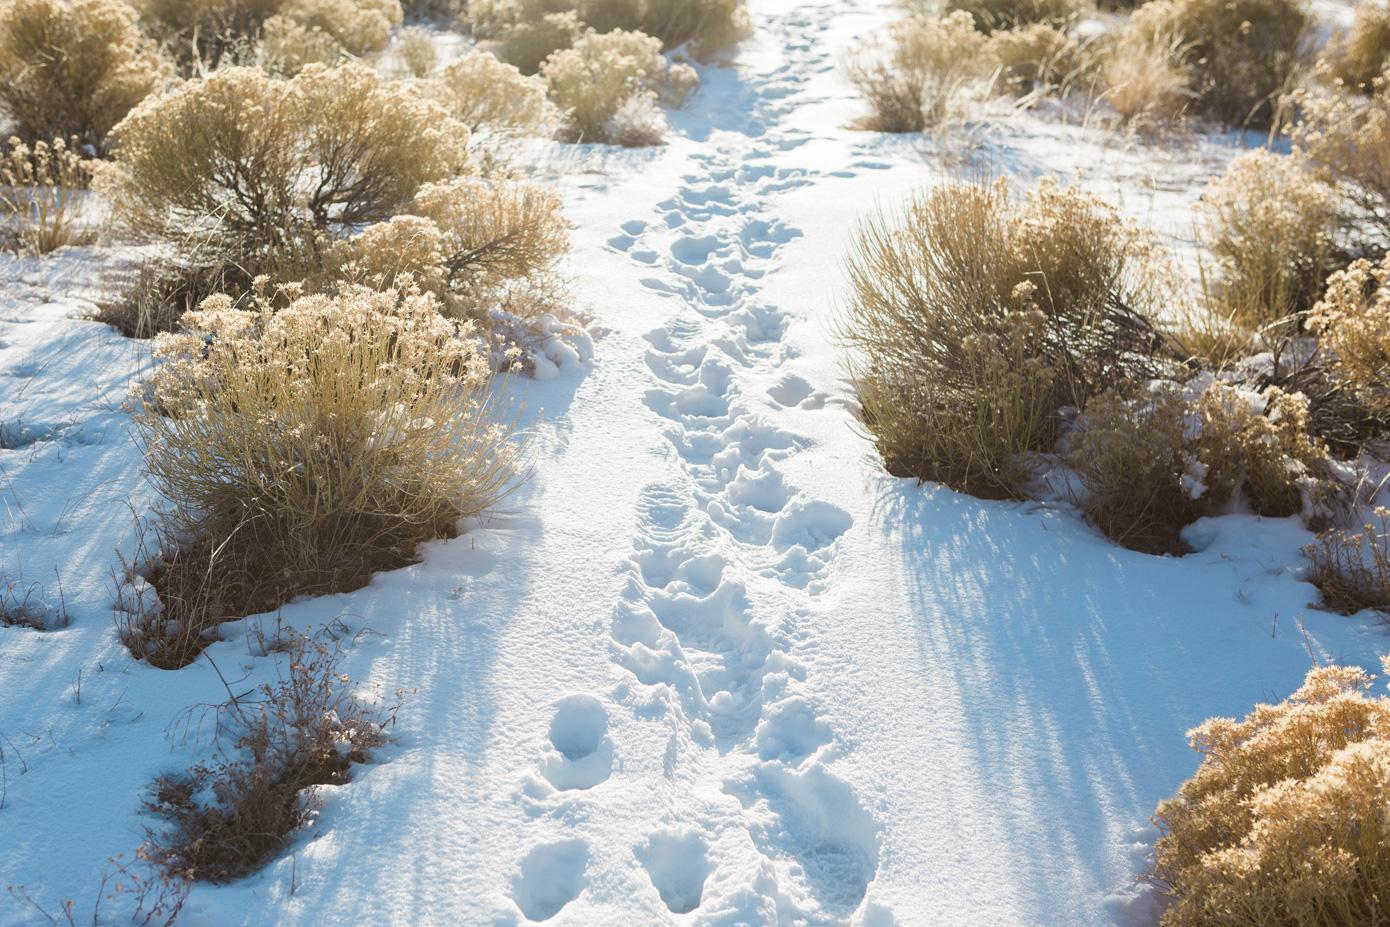 CindyGiovagnoli_Great_Sand_Dunes_Zion_National_Park_Horseshoe_Bend_Truck_Camping_Toyota_The_Narrows_roadtrip_Utah_Colorado-004.jpg